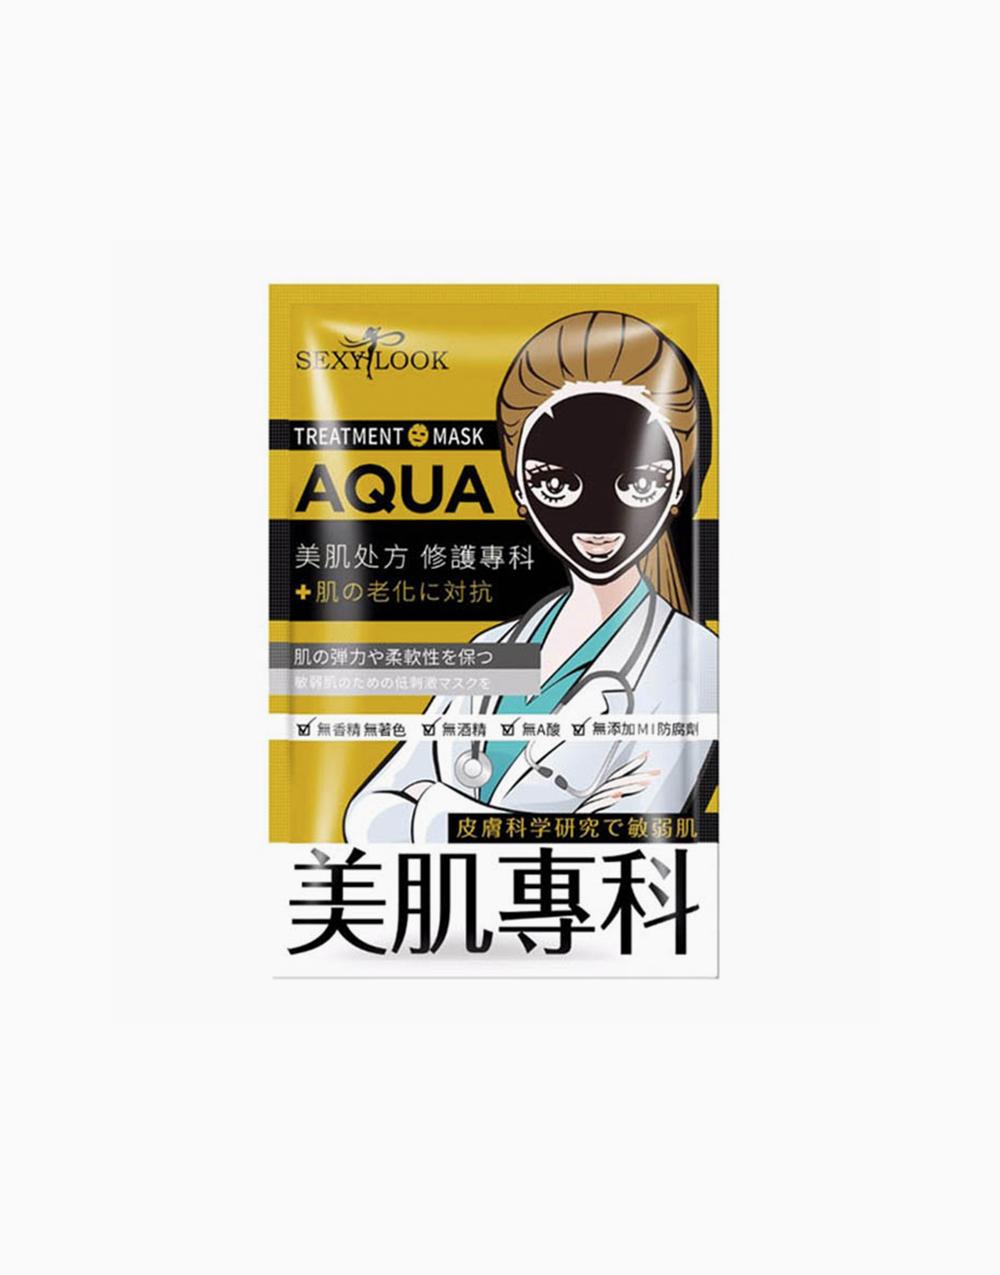 Medibeauty Repairing Black Mask by SEXYLOOK